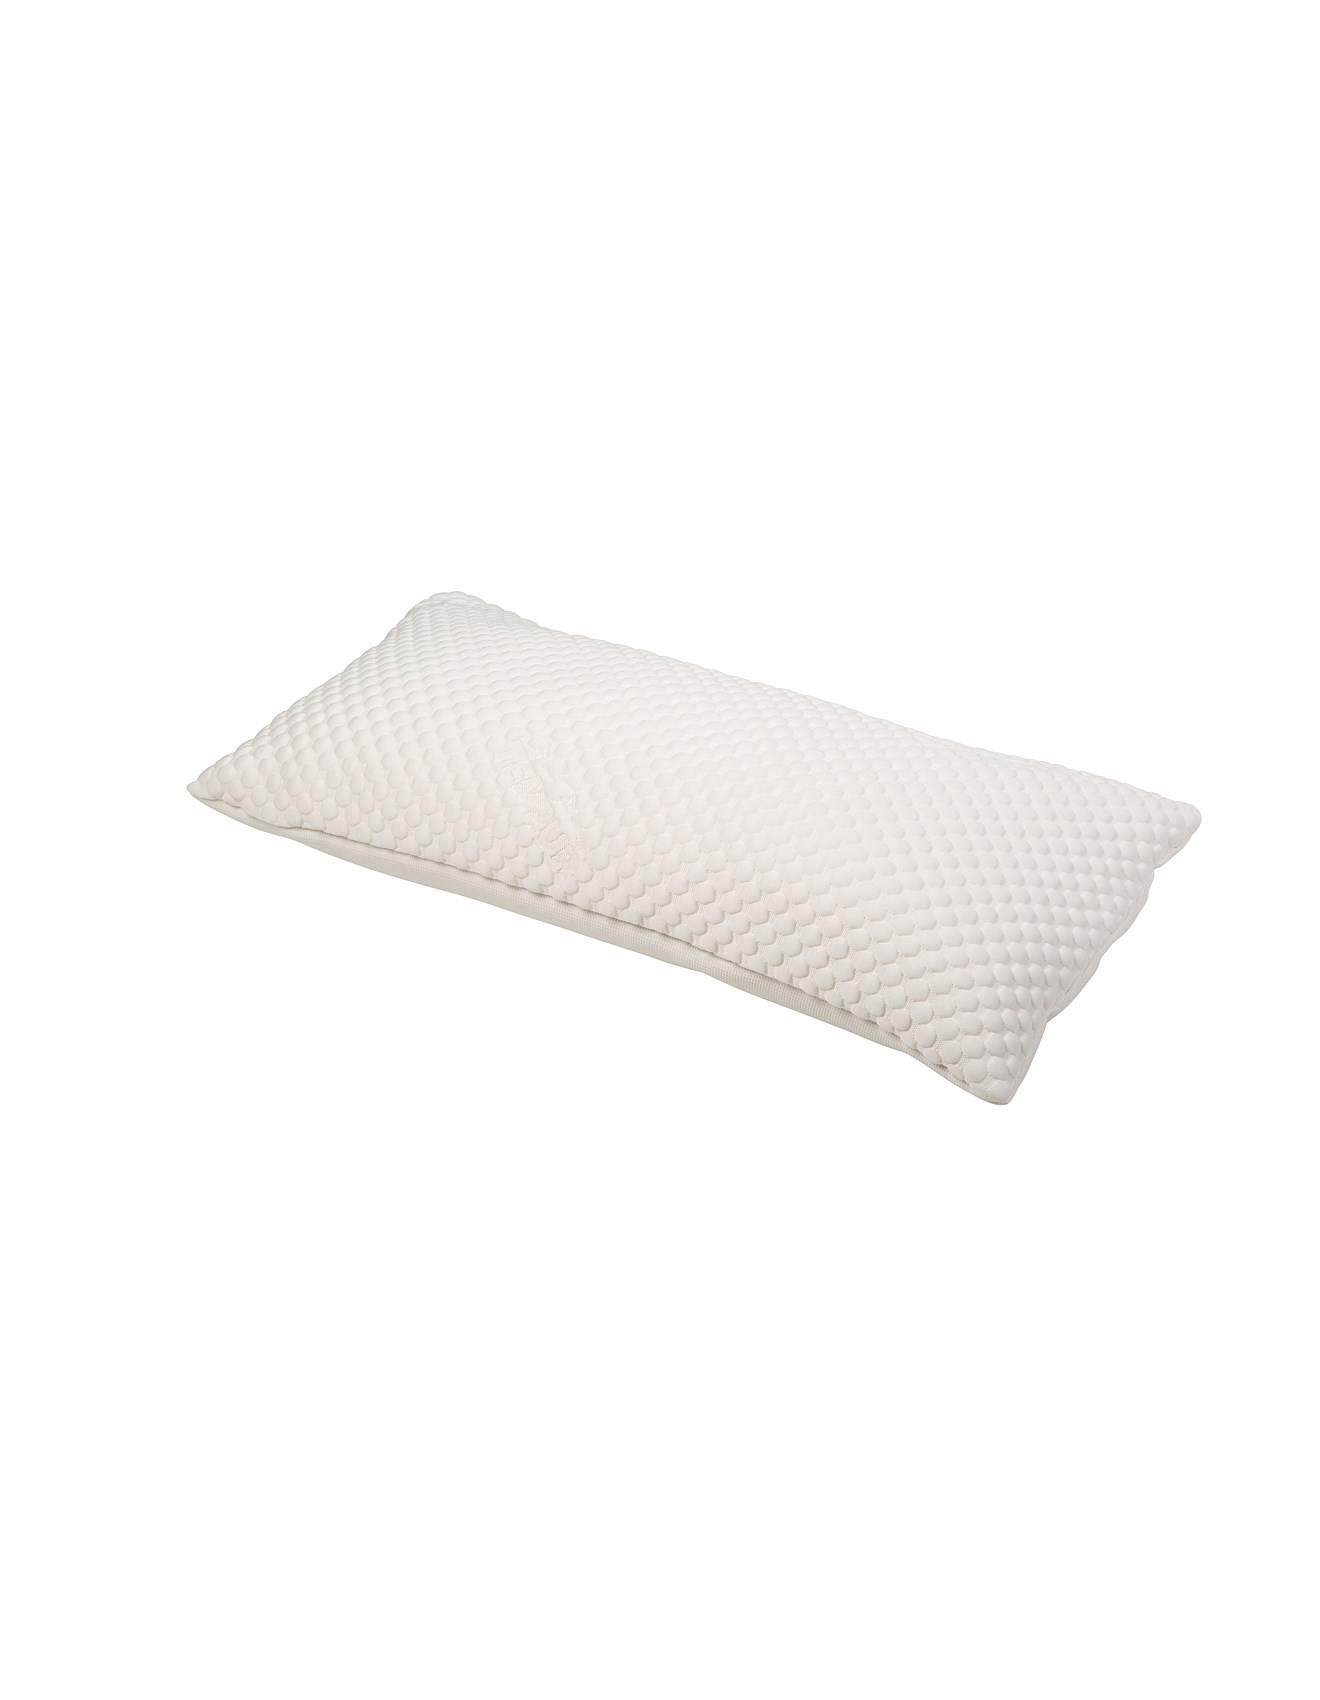 tempur buy tempur pillows online david jones comfort. Black Bedroom Furniture Sets. Home Design Ideas